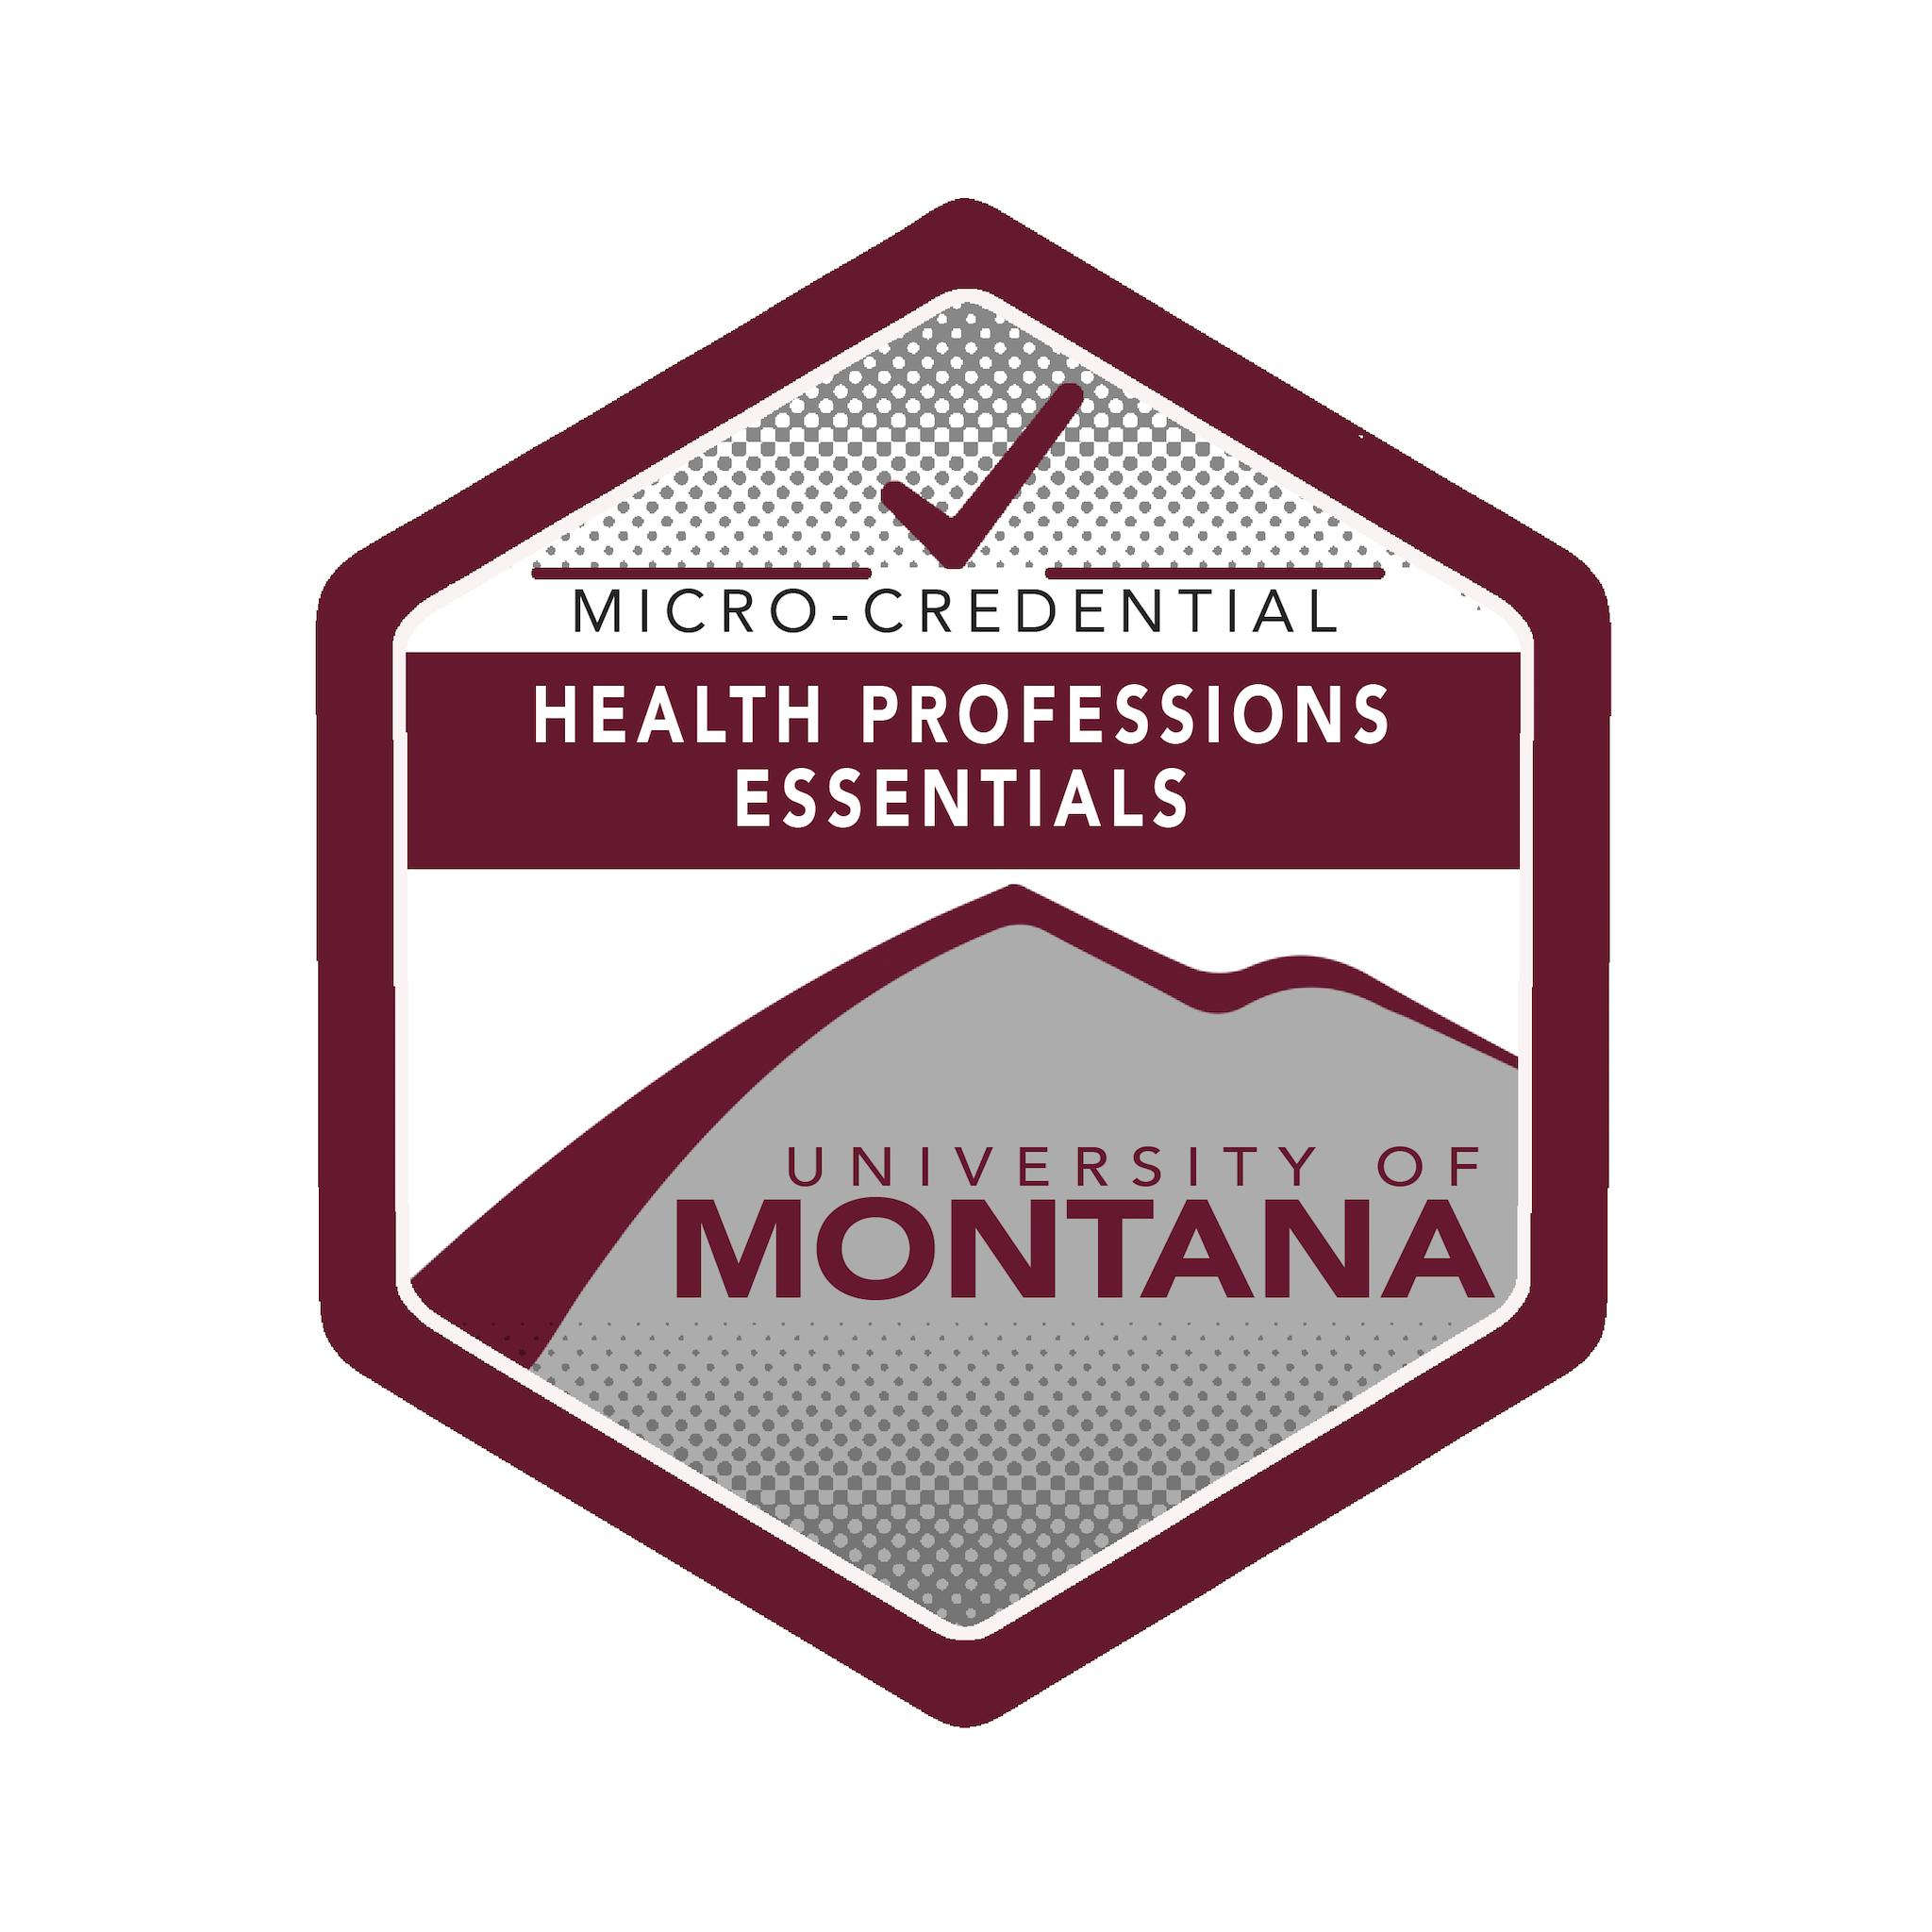 Health Professions Essentials